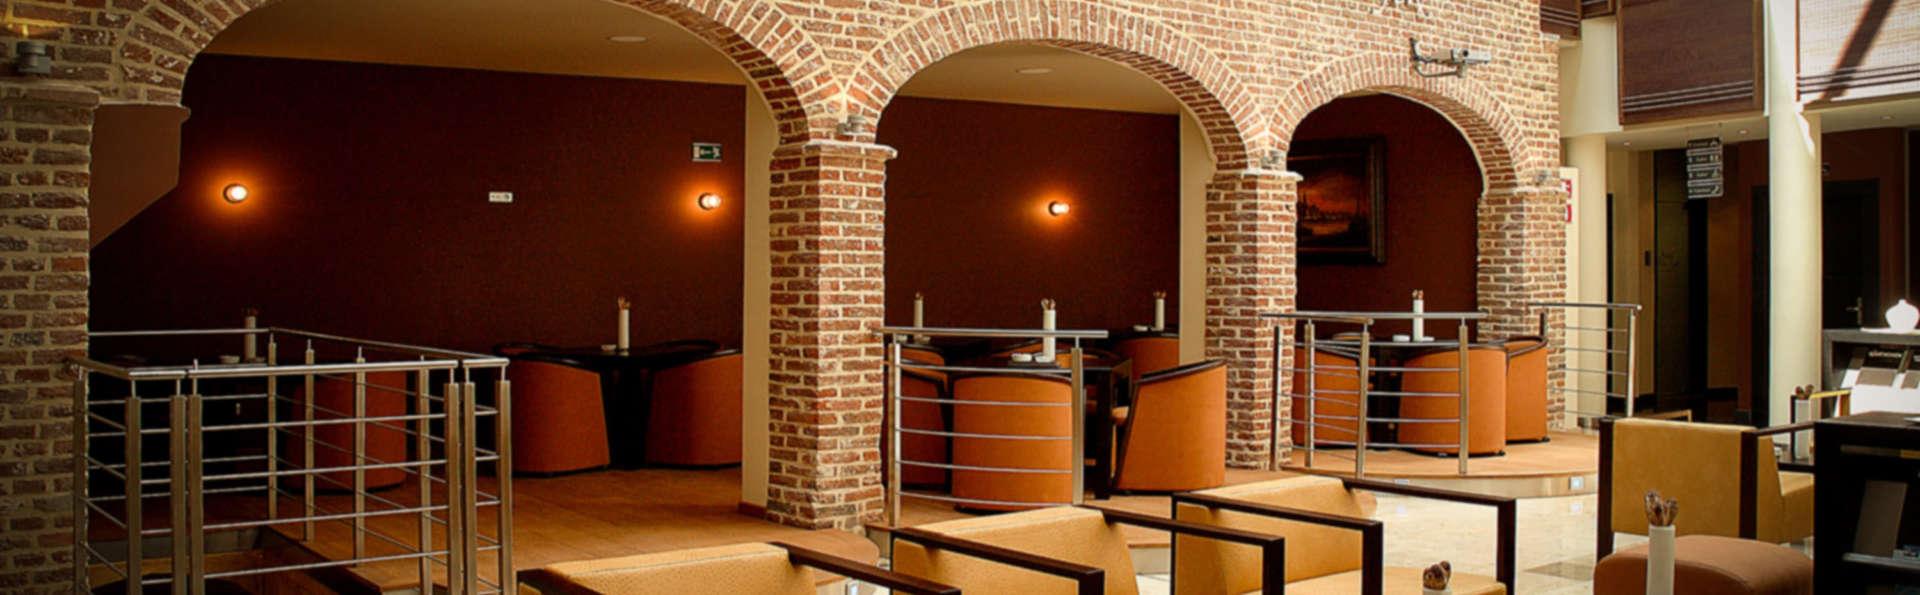 Van Eyck Hotel  - EDIT_Atrium_2-min.jpg